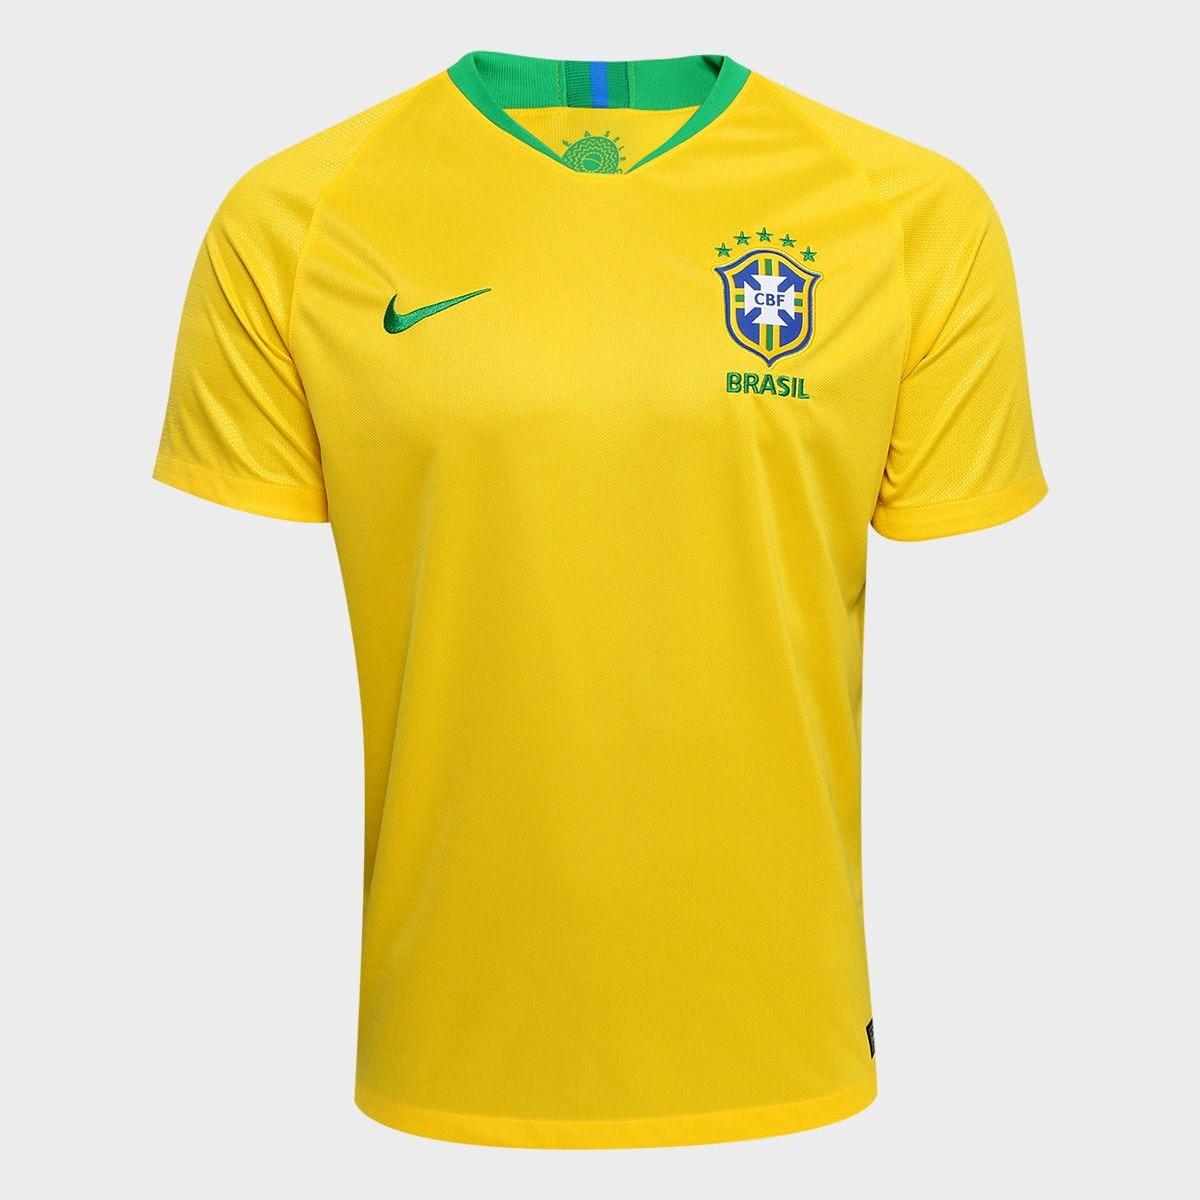 d845b5752a camisa seleção brasil i 2018 s n° - torcedor nike masculina. Carregando zoom .